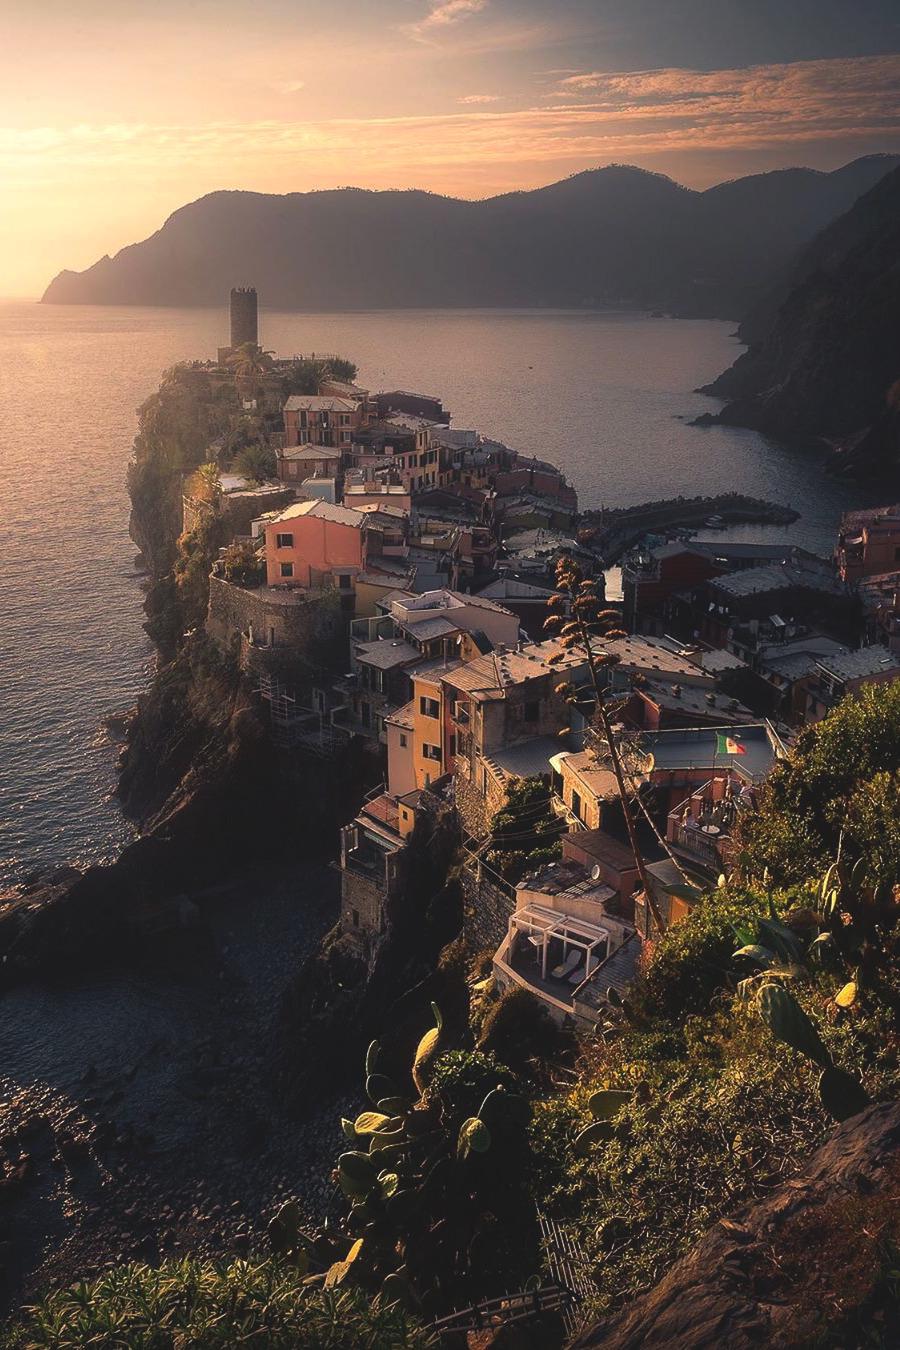 Pin by Paco Santomé on fotos de paisajes in 2020 Italy